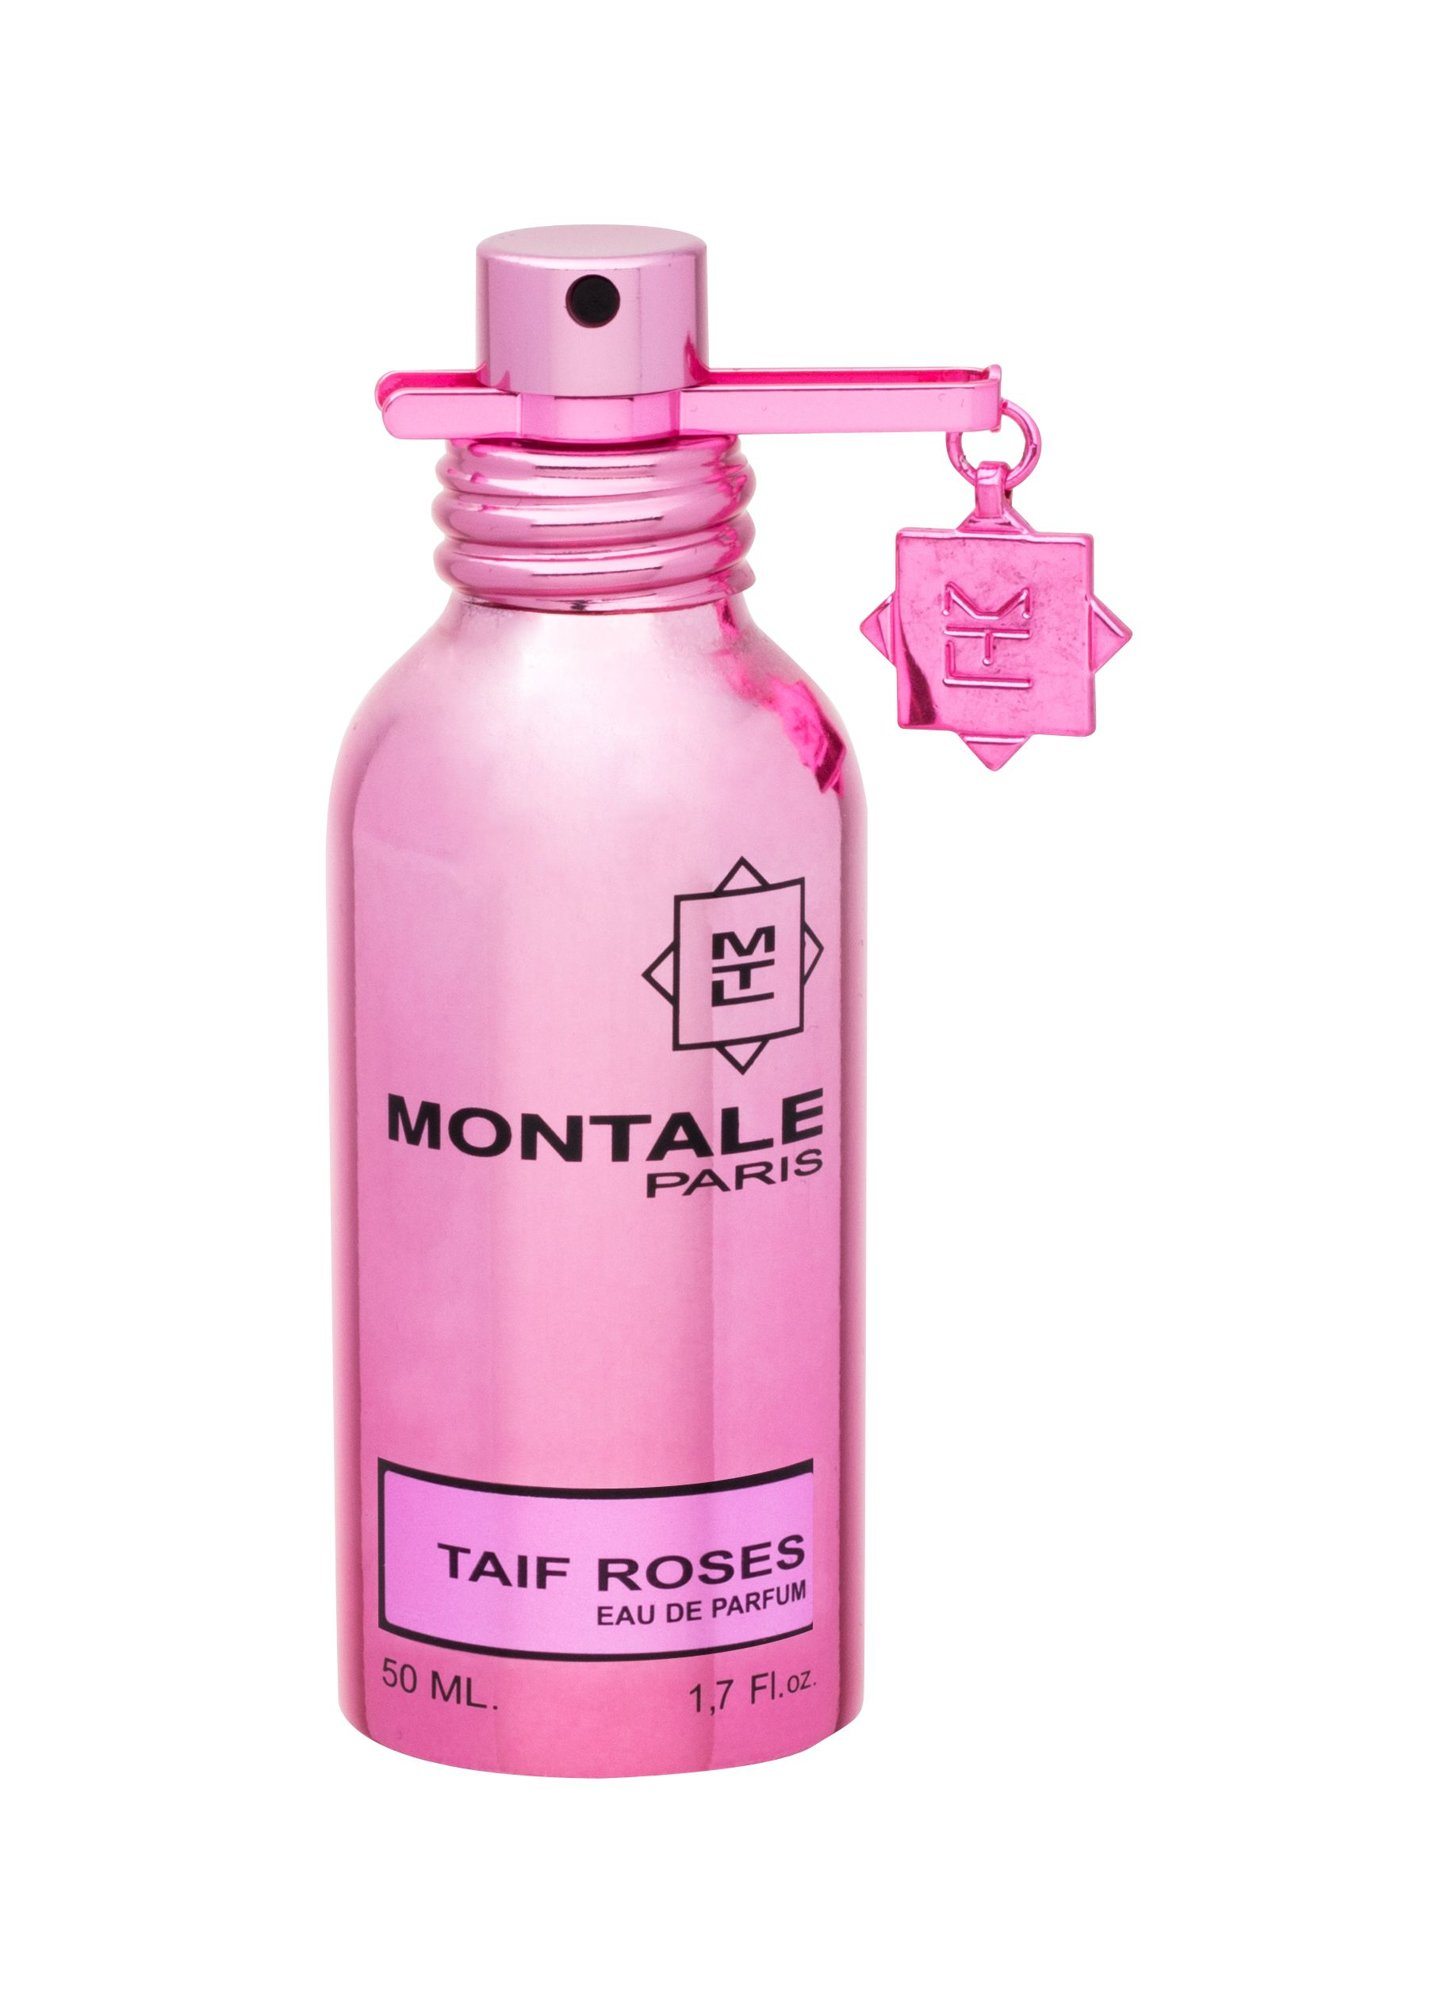 Montale Paris Taif Roses EDP 50ml